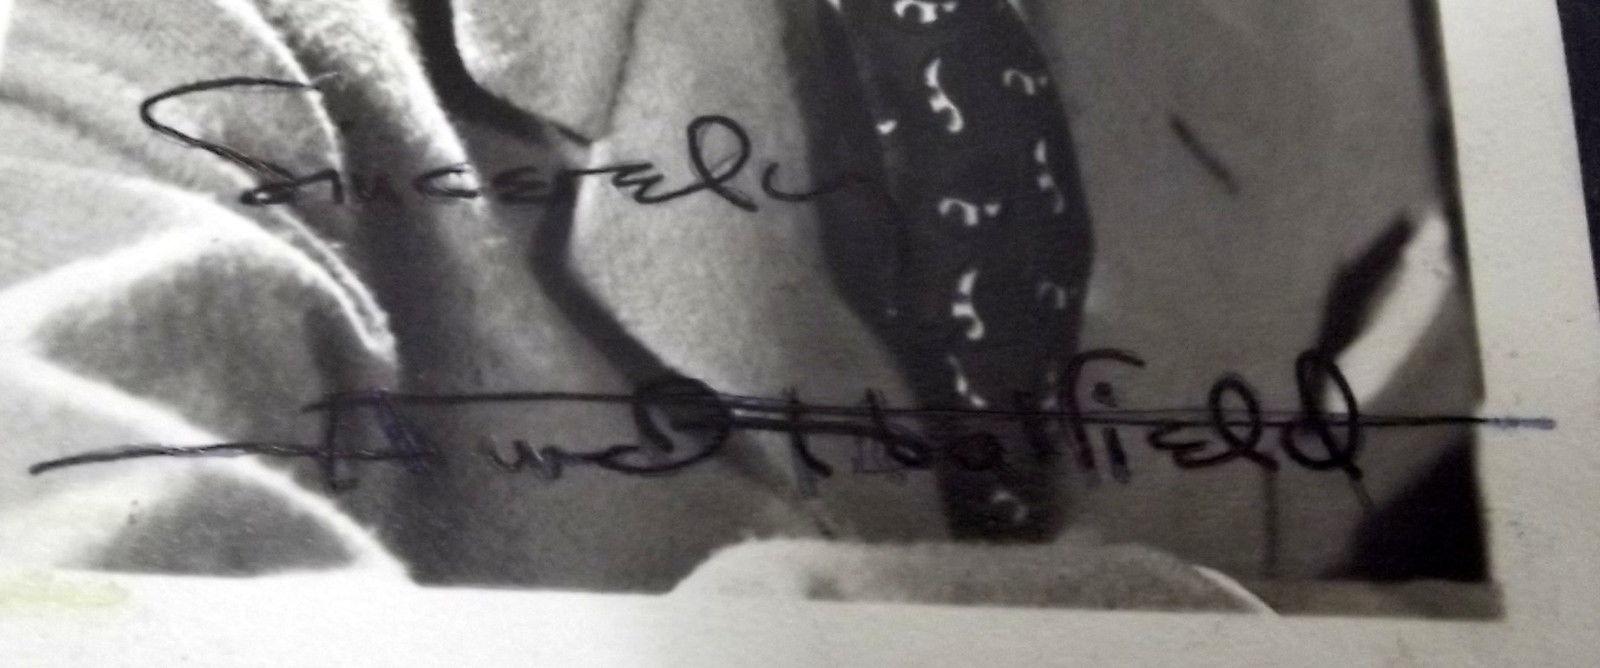 OSCAR WILDE,HURD HATFIELD (PICTURE OF DORIAN GRAY) AUTOGRAPH PHOTO (WOW)